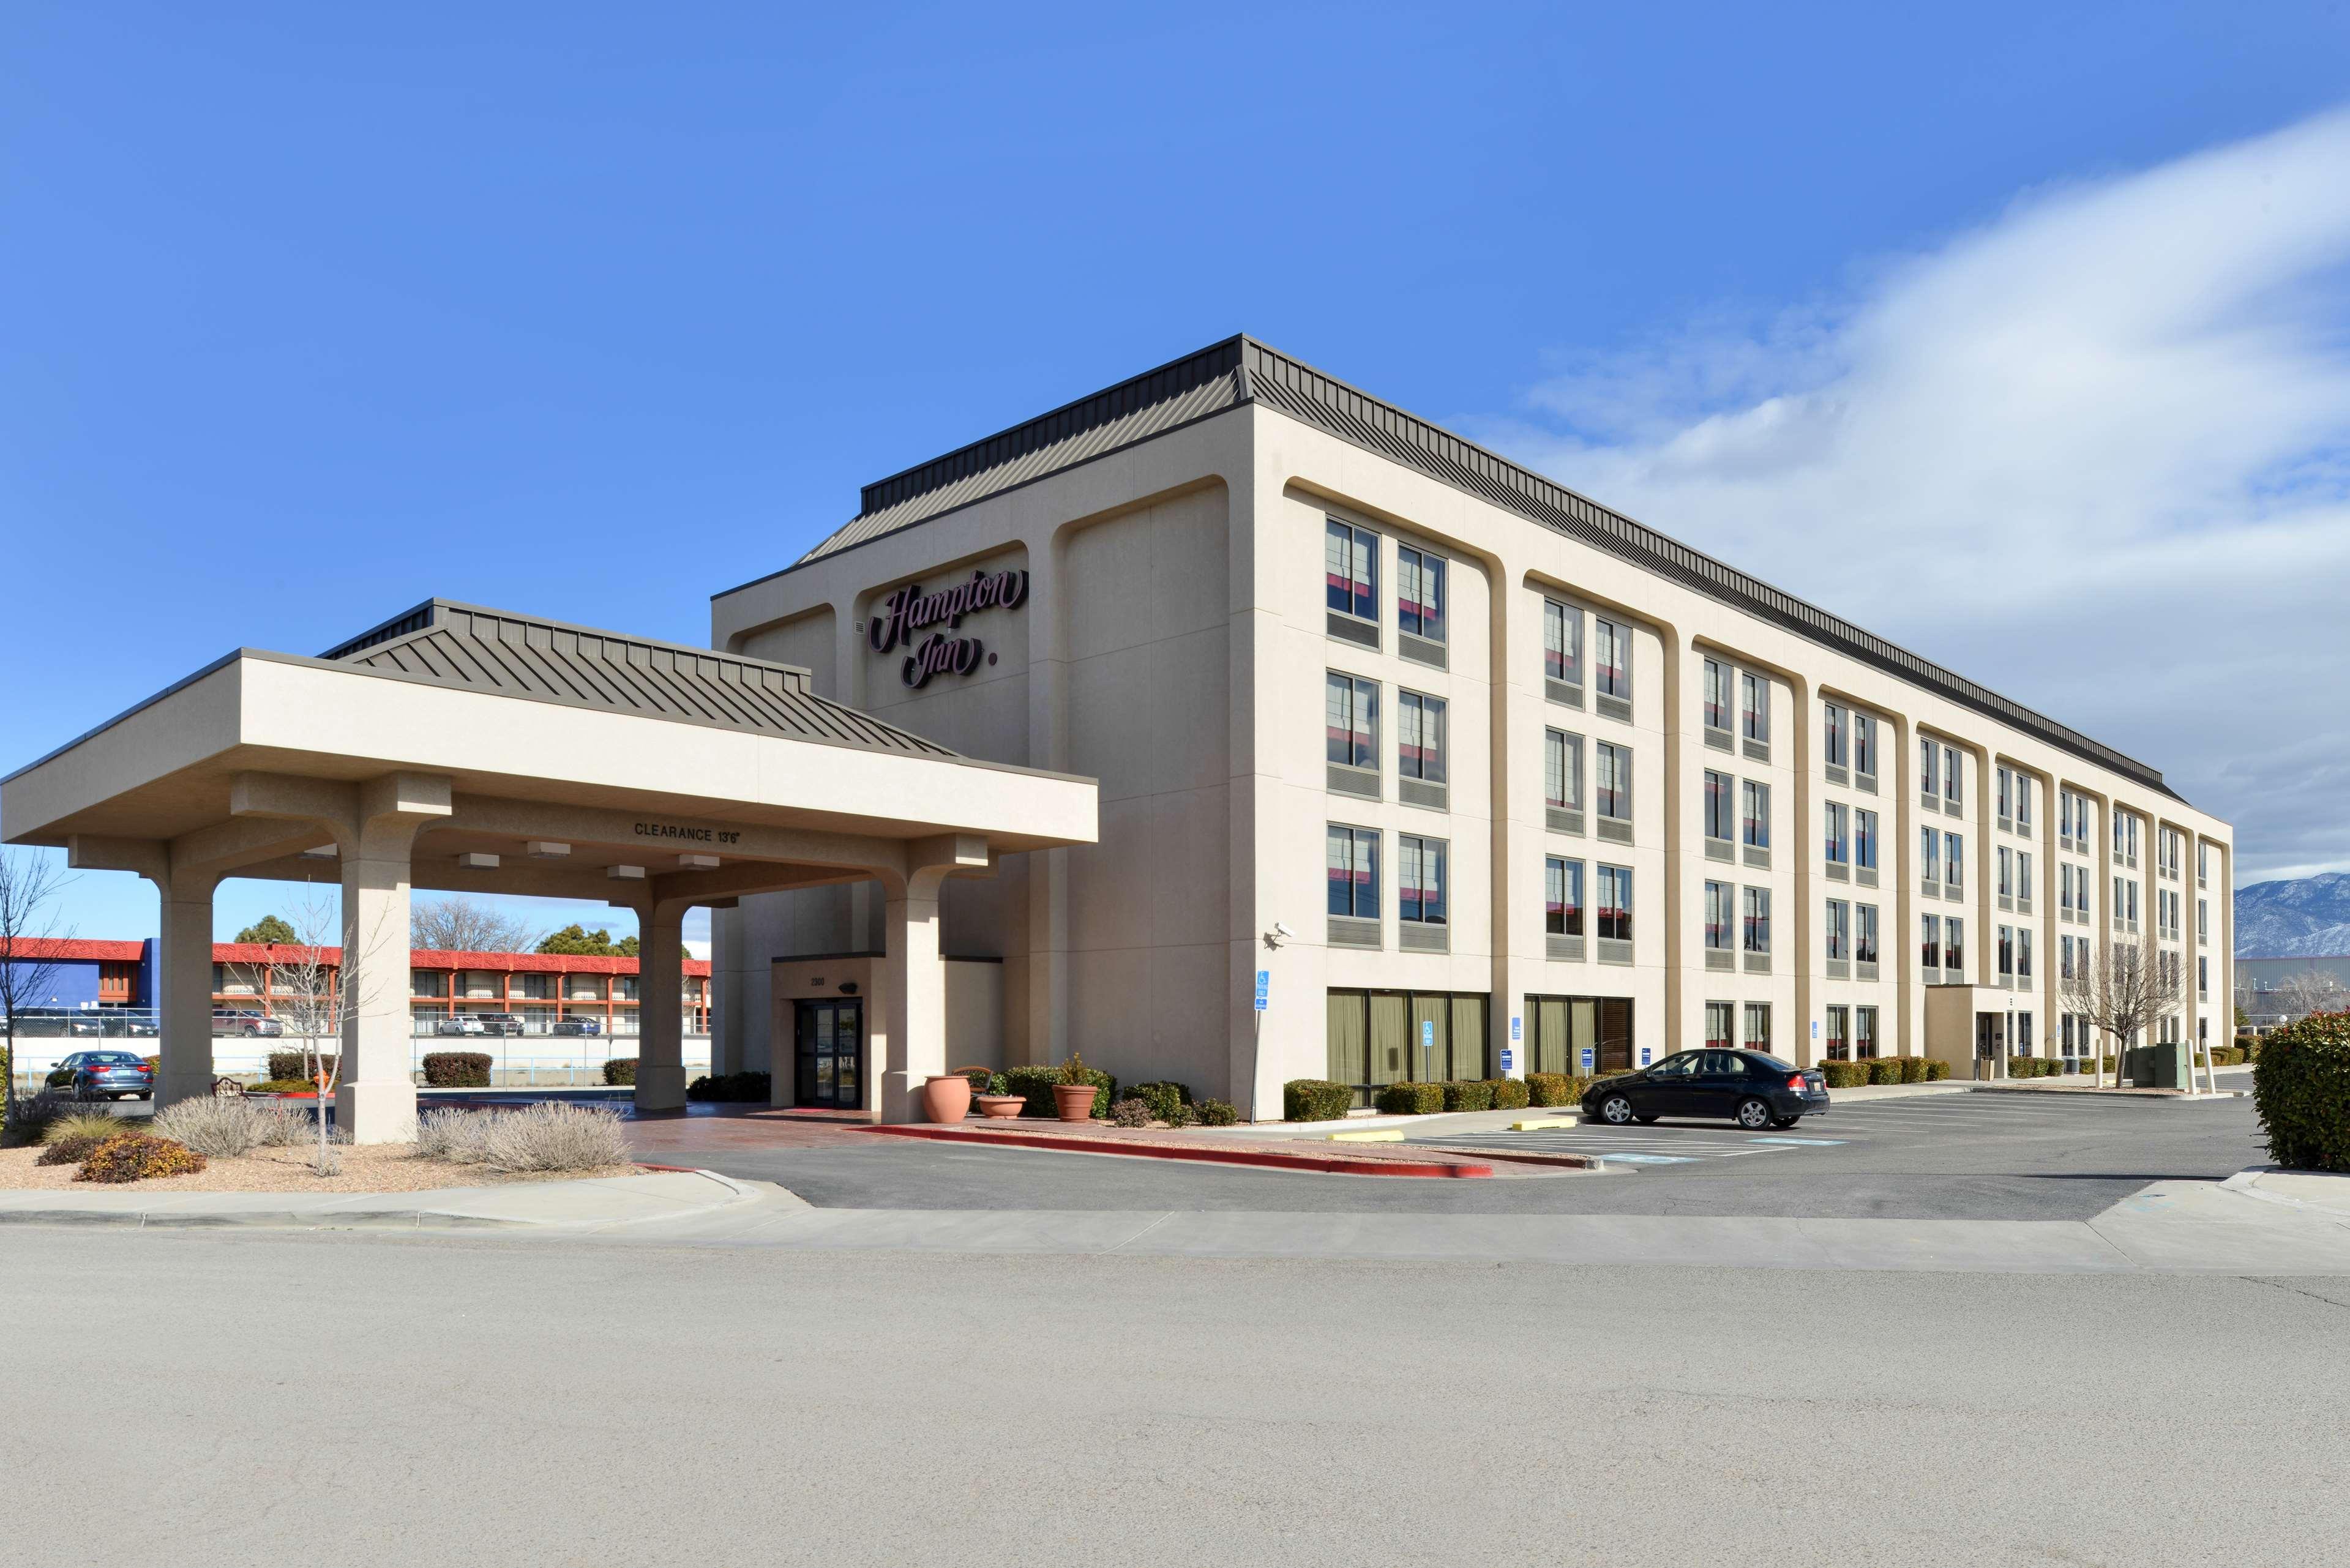 Hampton Inn Albuquerque-University/Midtown image 0